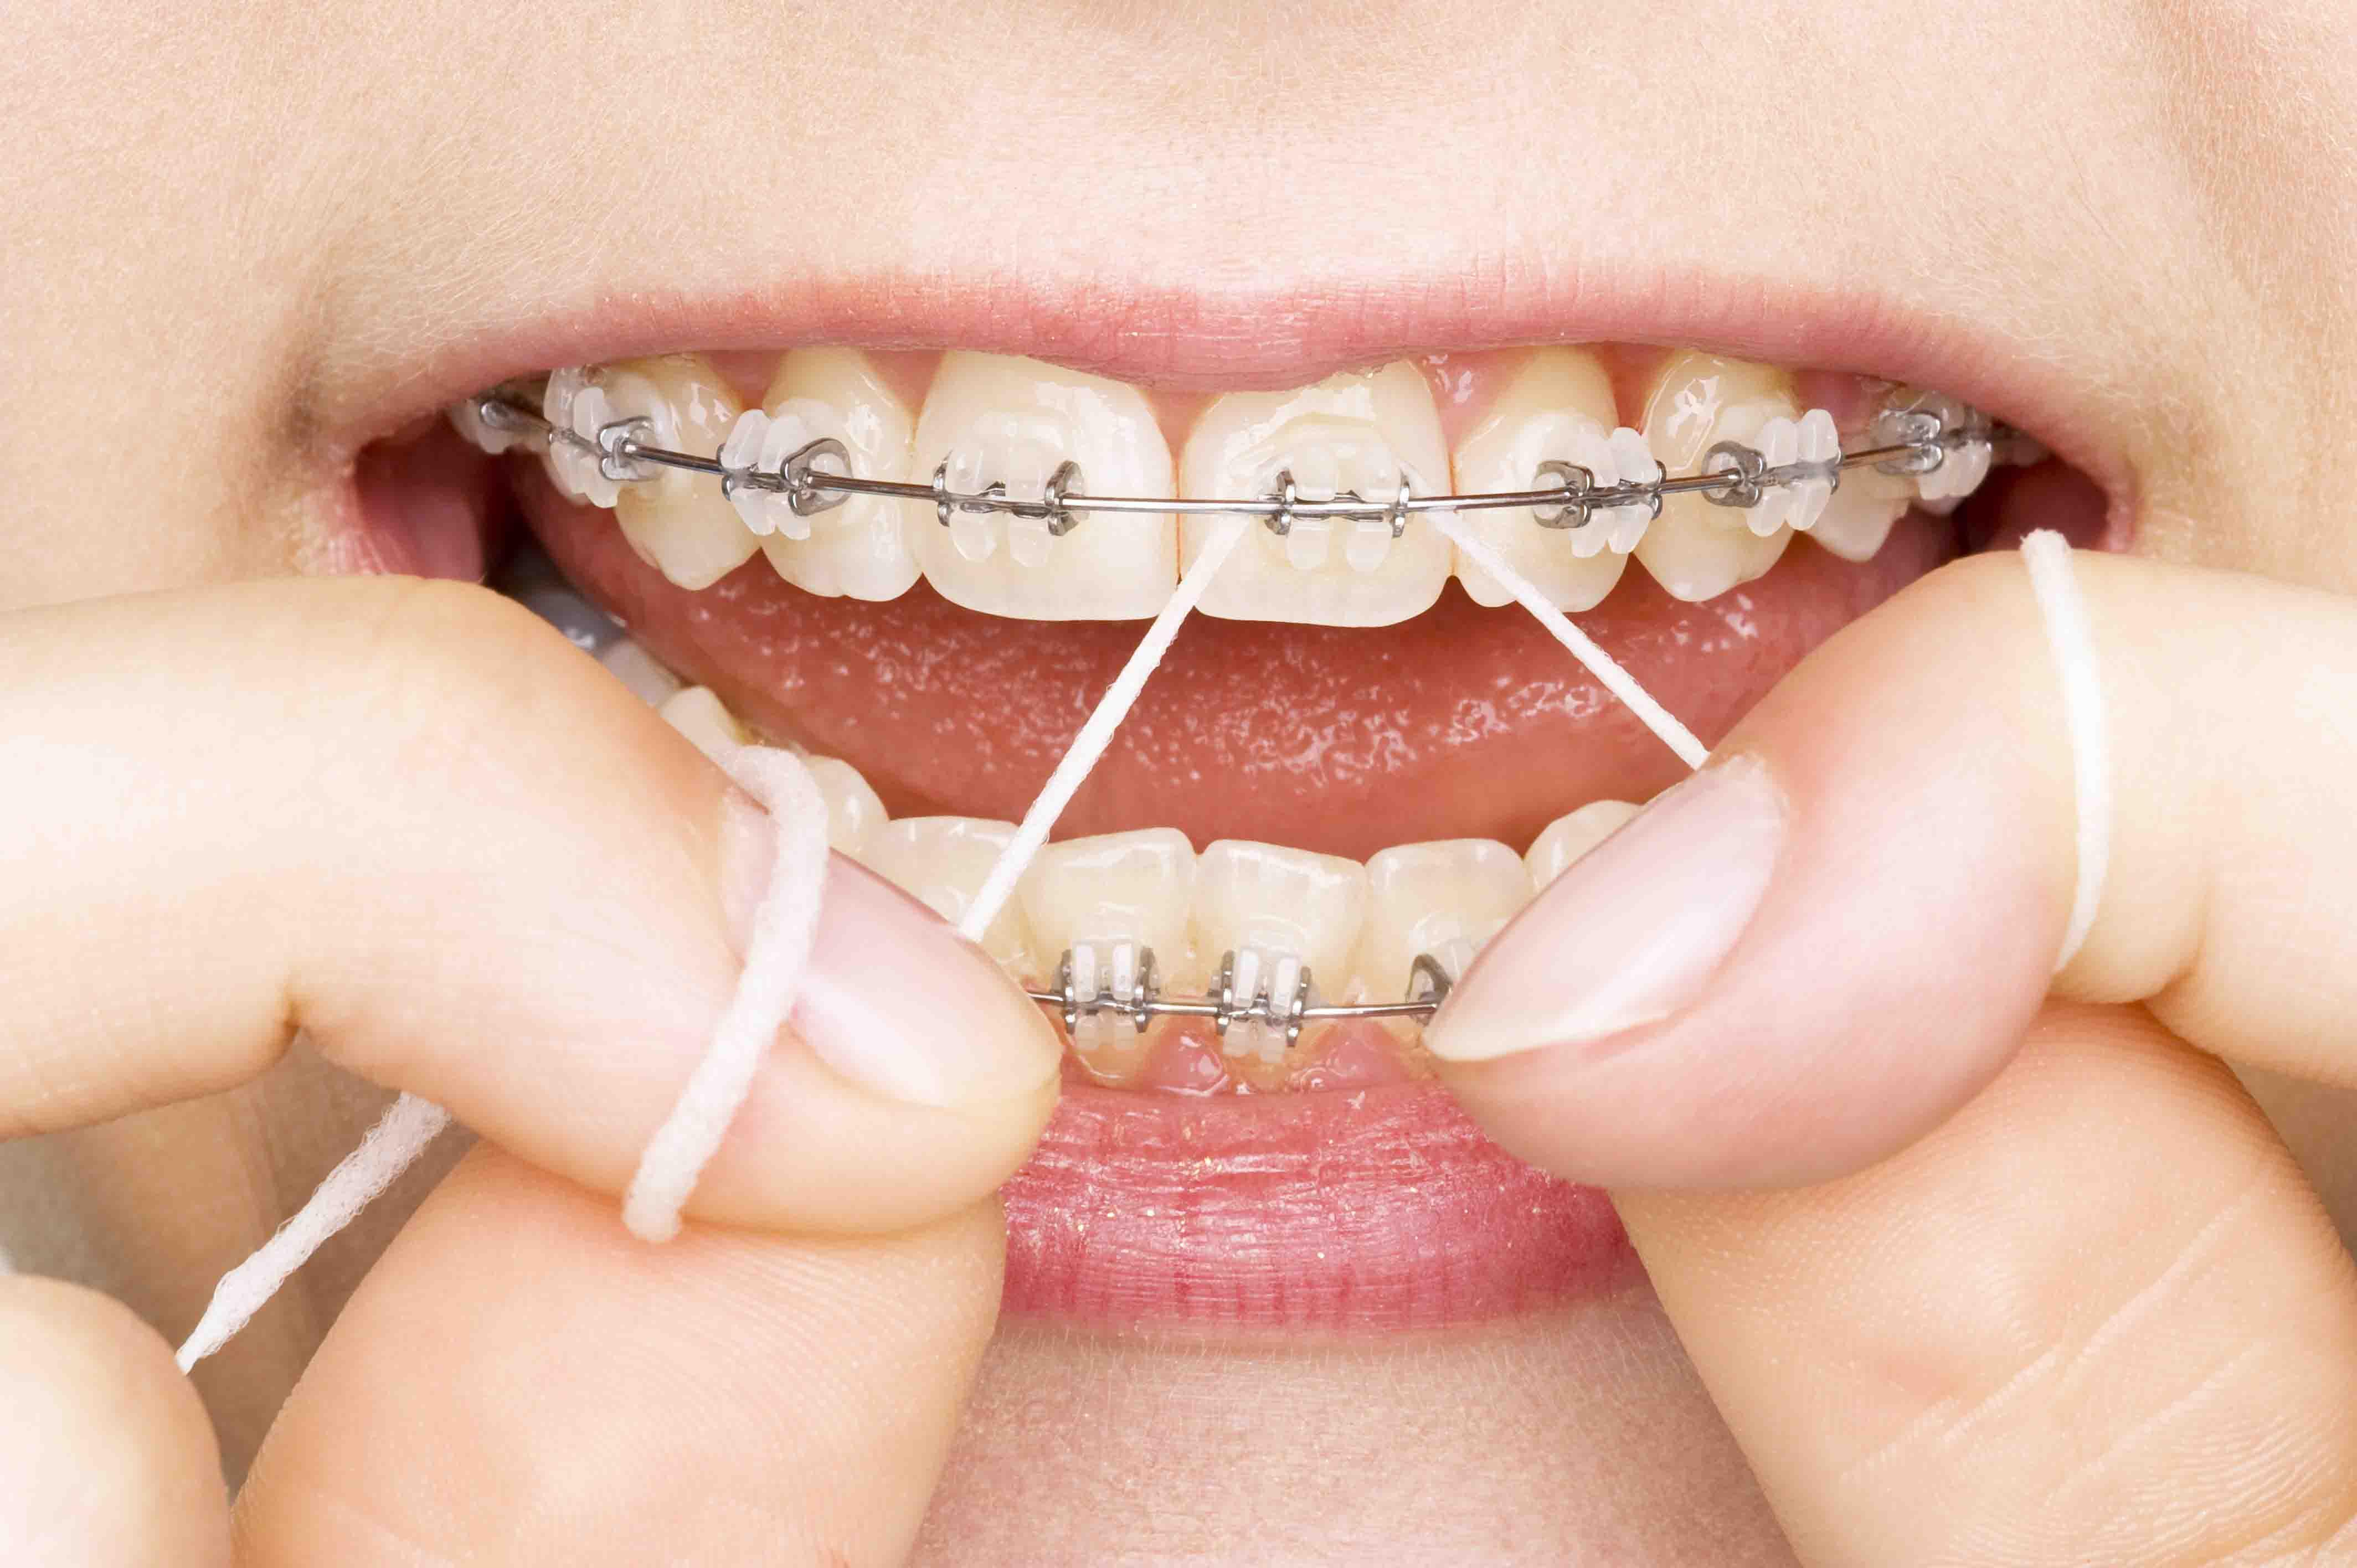 Reasons to Choose Dental Savings Plans